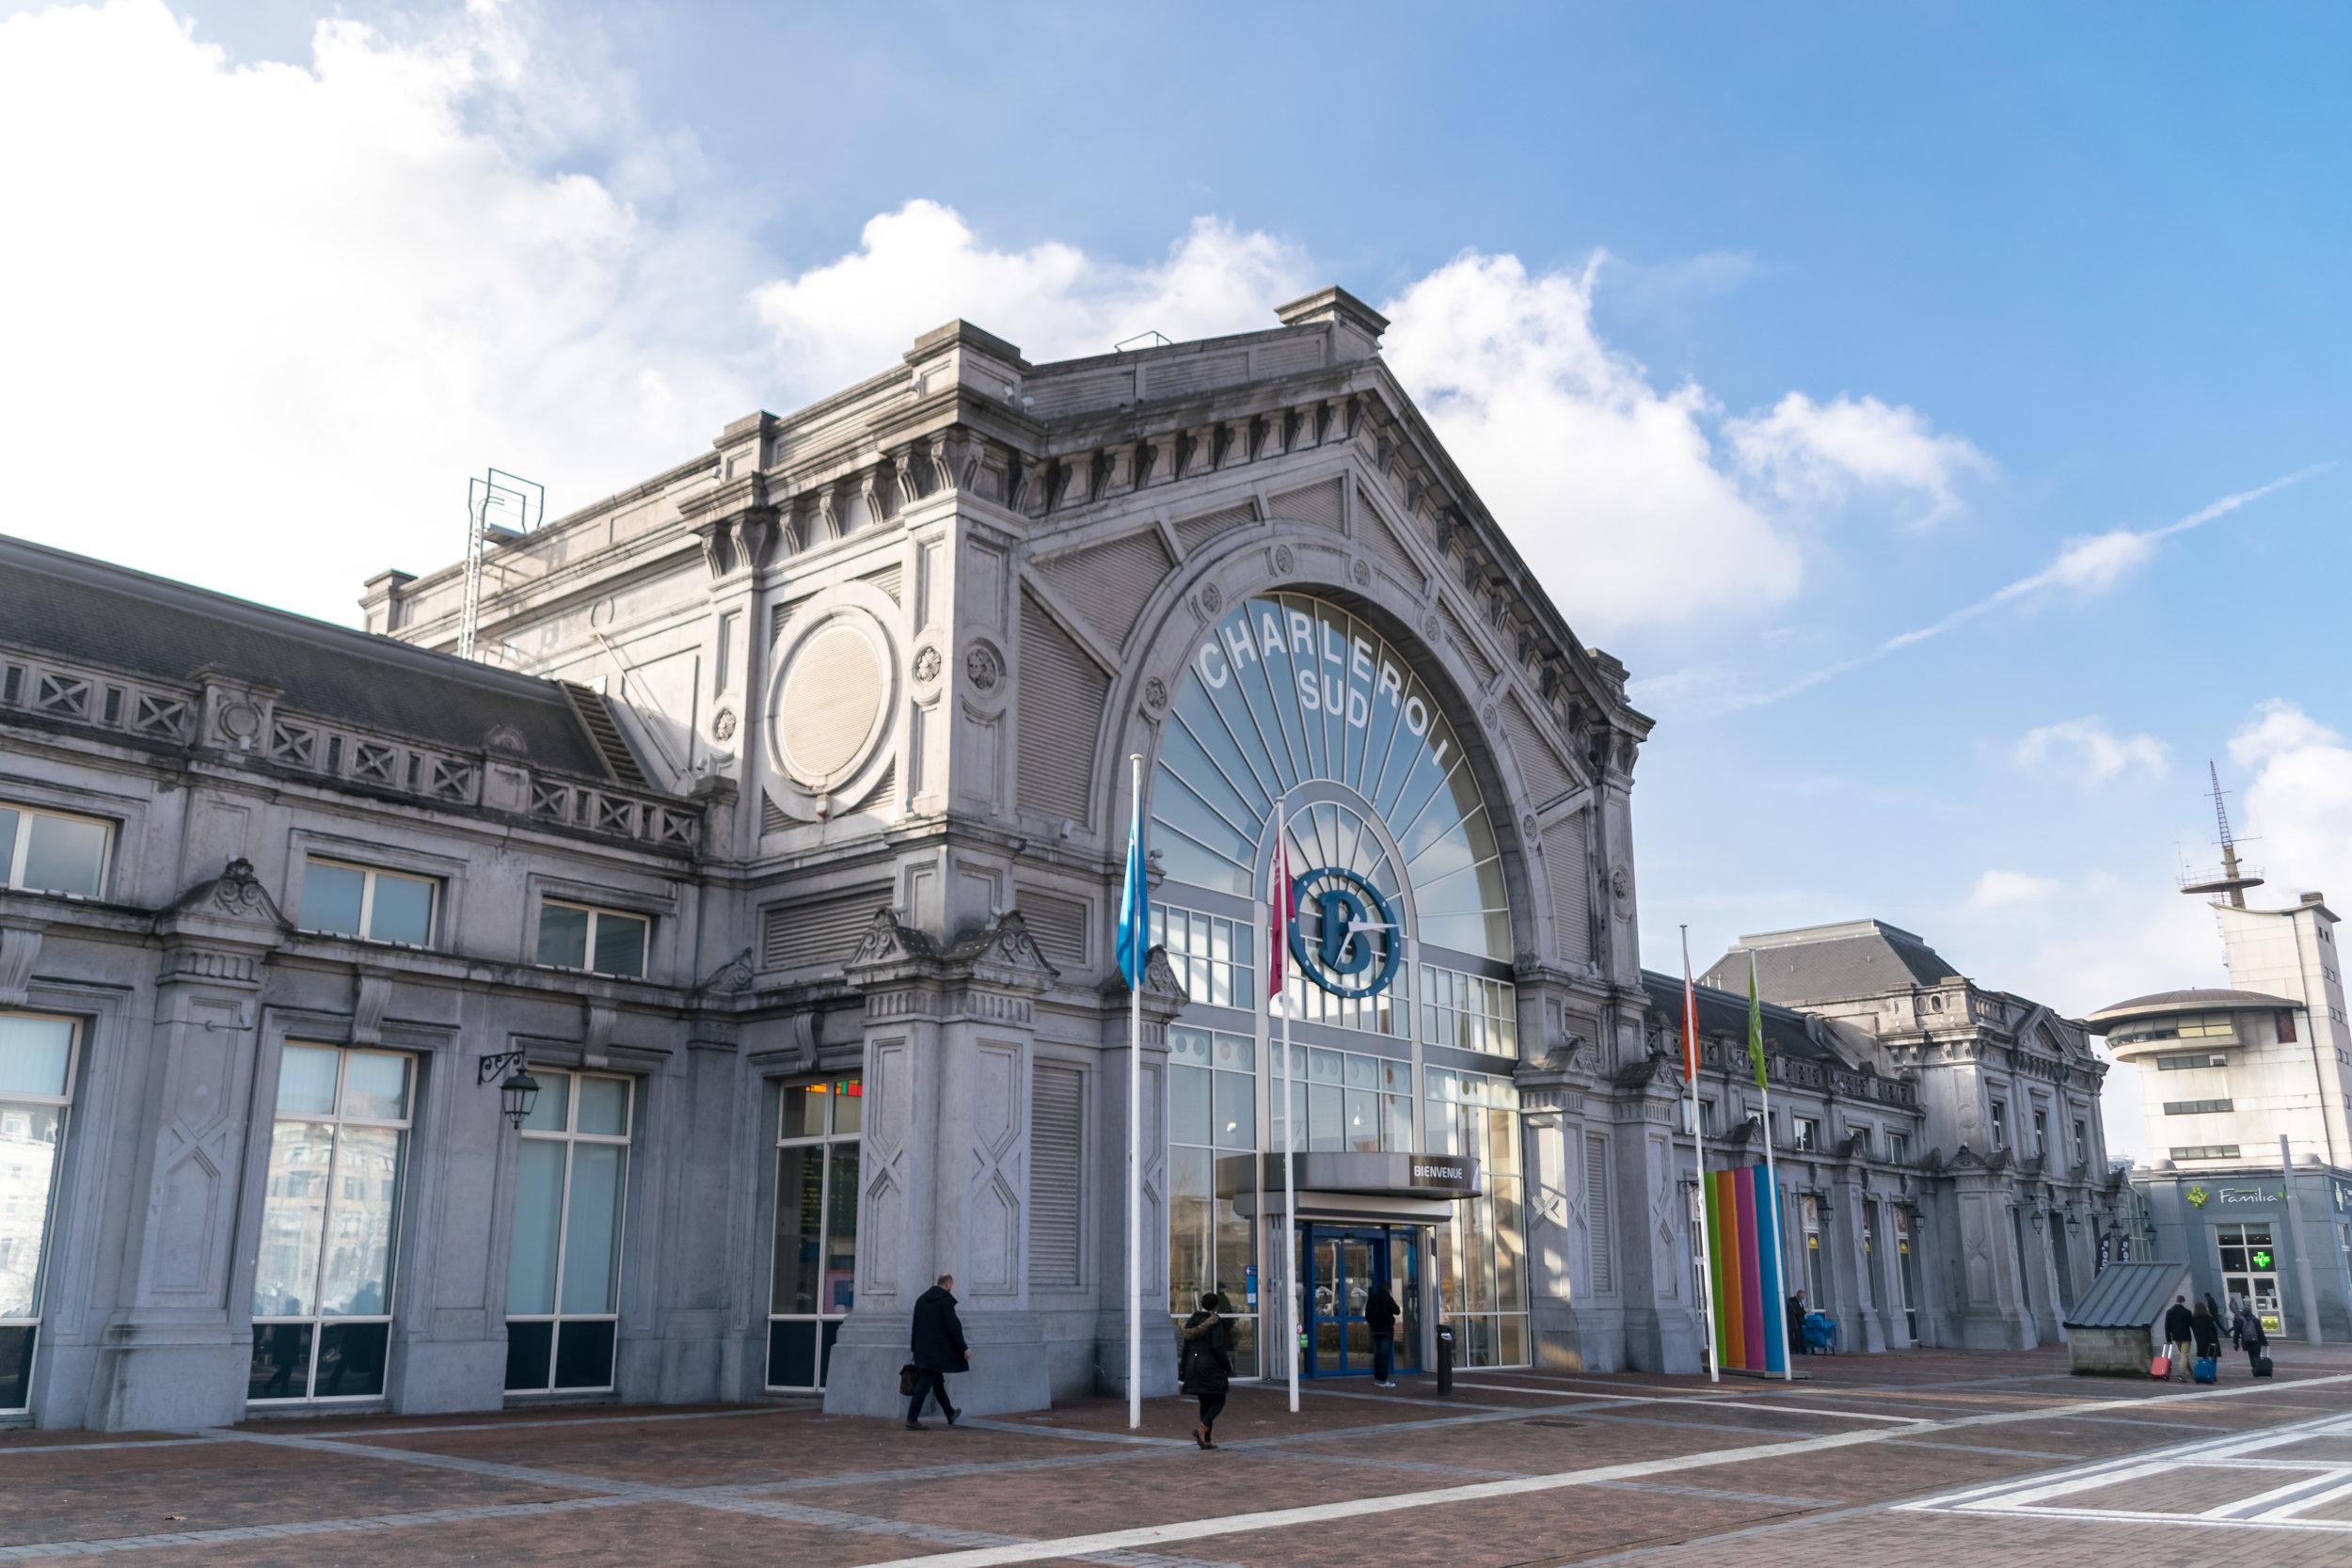 Charleroi station